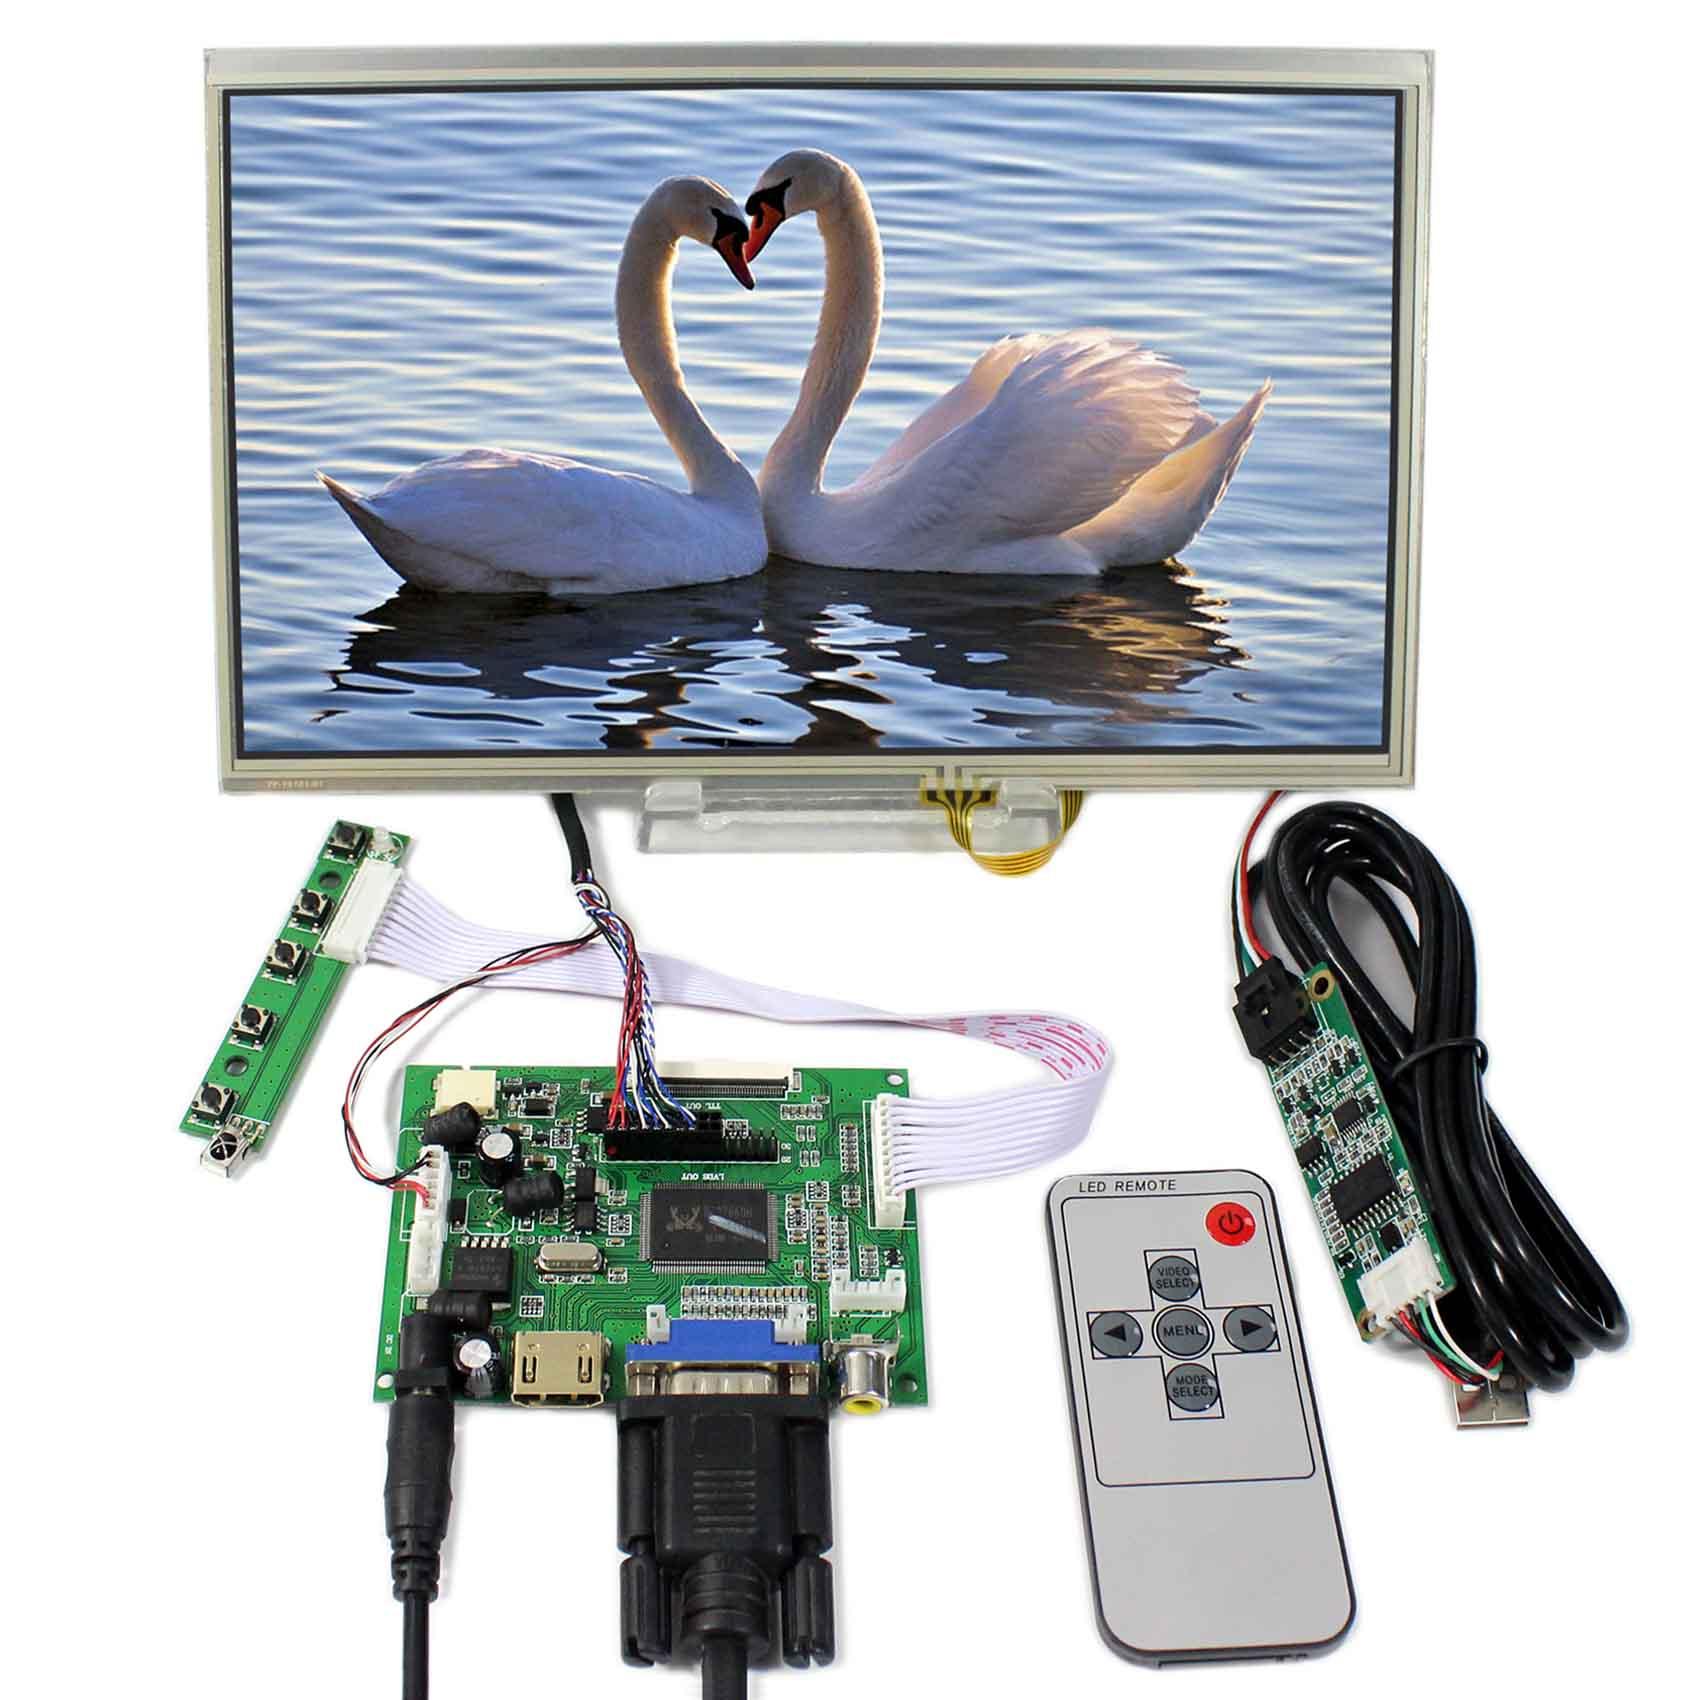 Hdmi Vga 2av Lcd Controller Board 101 Inch B101aw03 Led Module P10 M10 7warna 1024x600 Layar Dengan Panel Sentuh